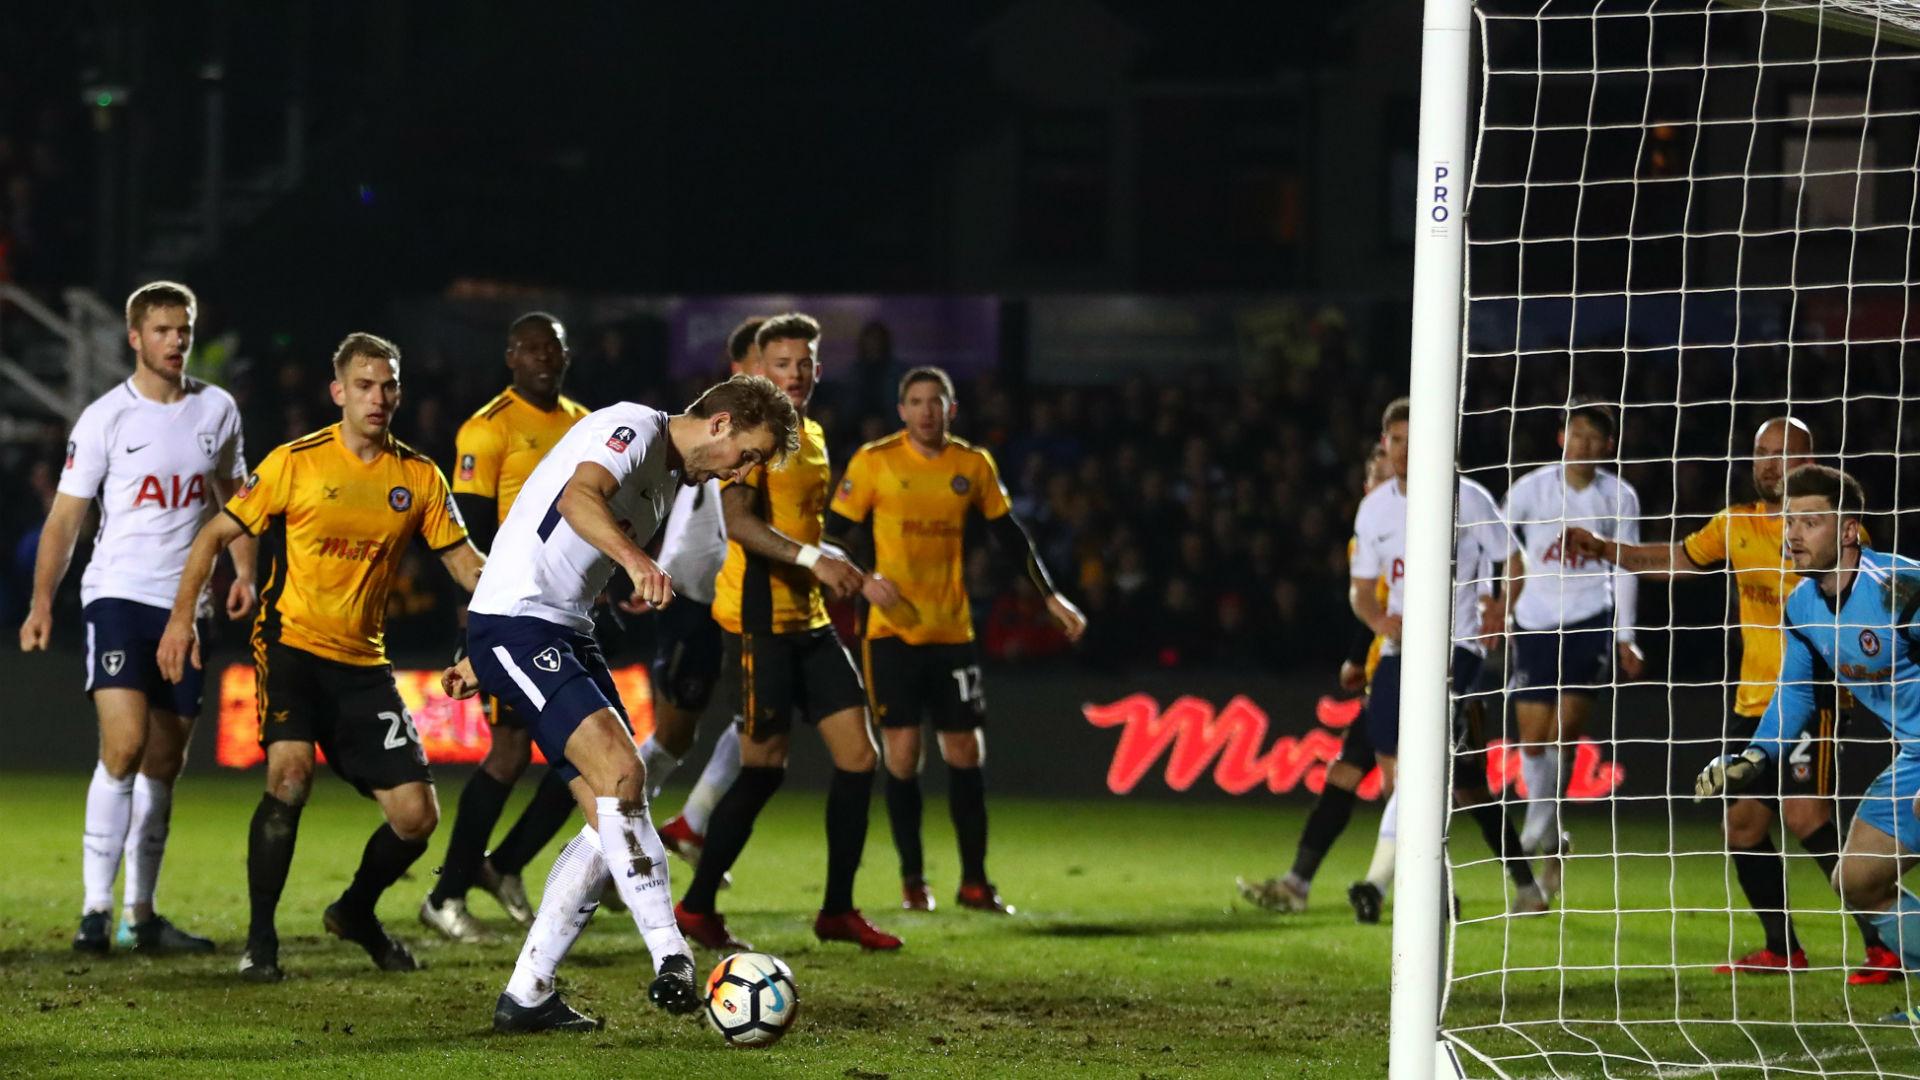 Newport County vs Tottenham Match Preview